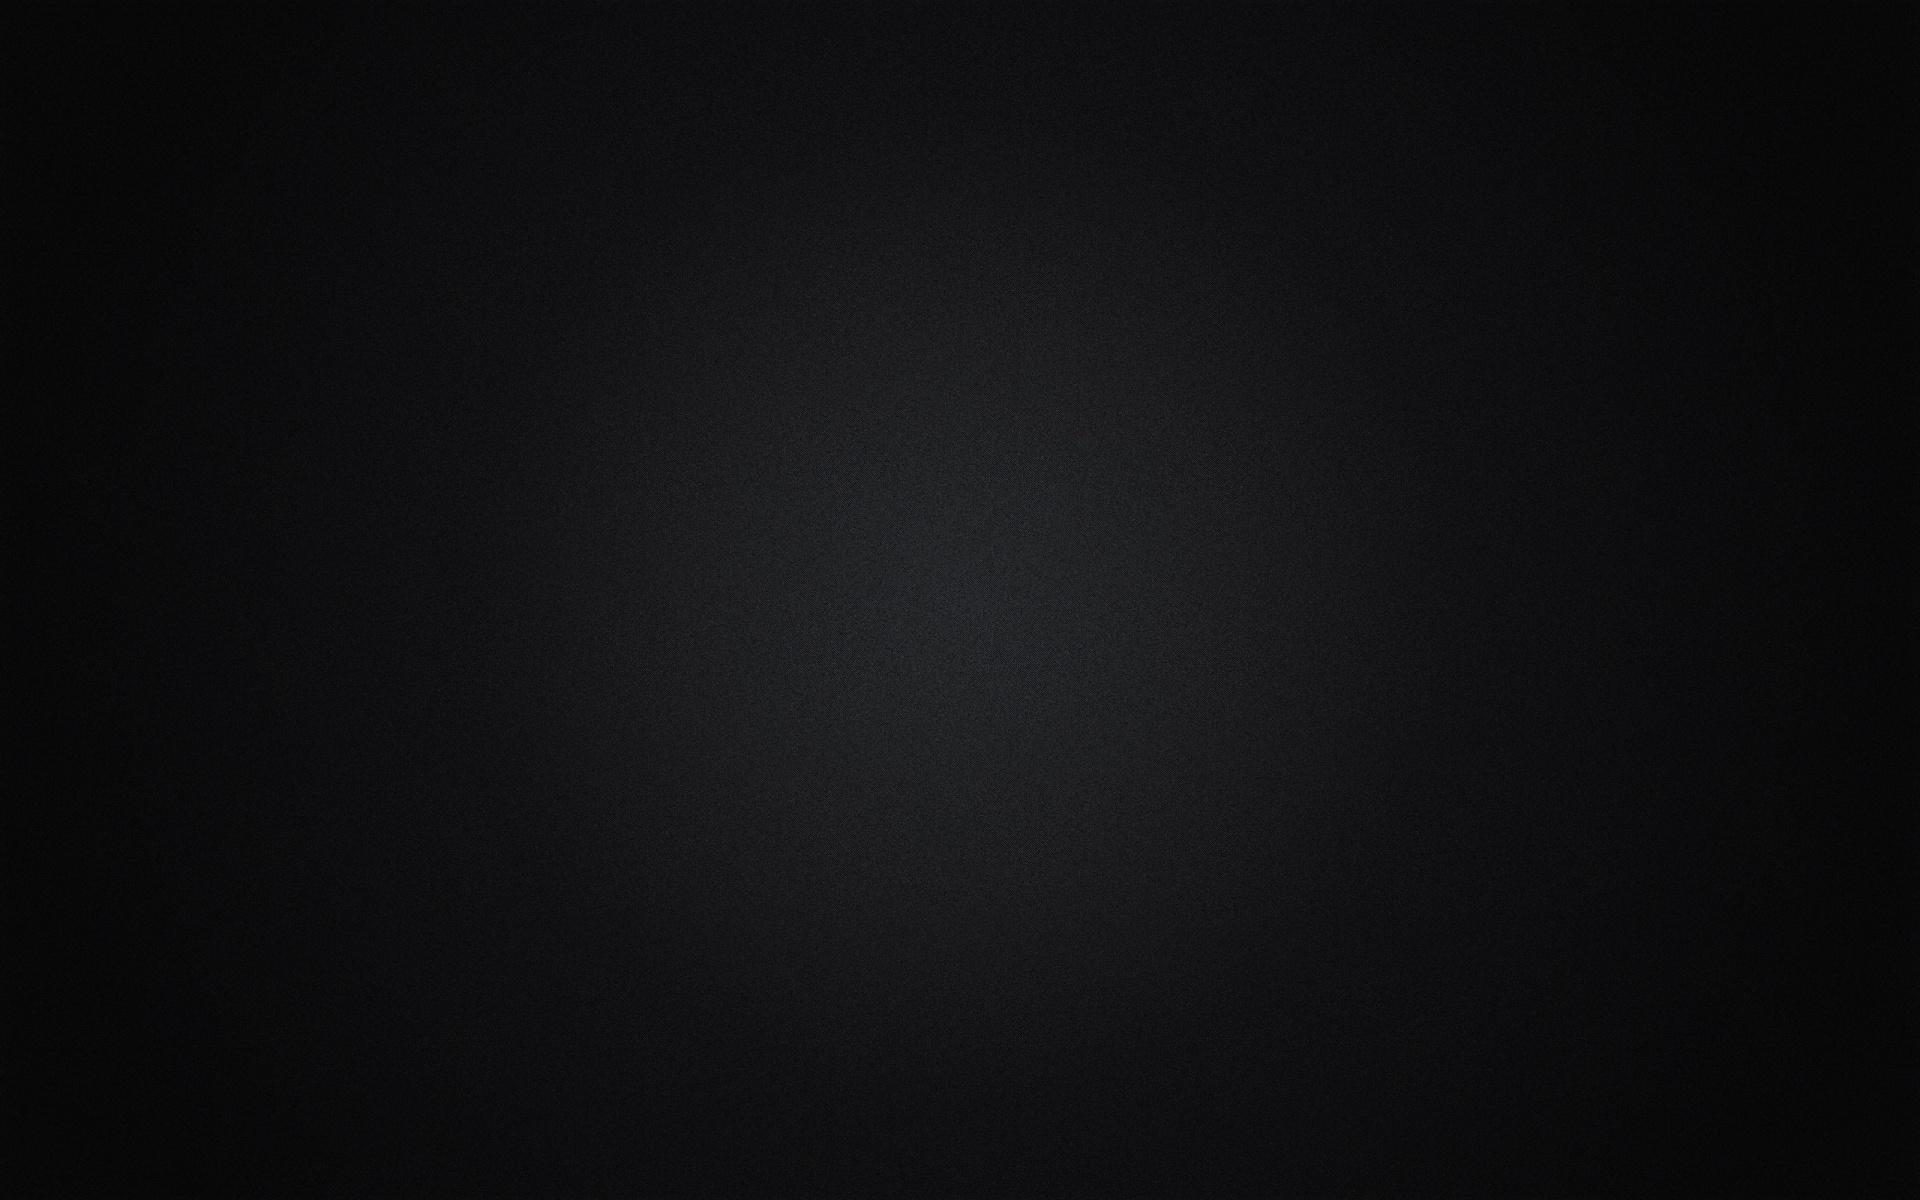 background black screen wallpaperswide desktop 1920 Black Background 1920x1200